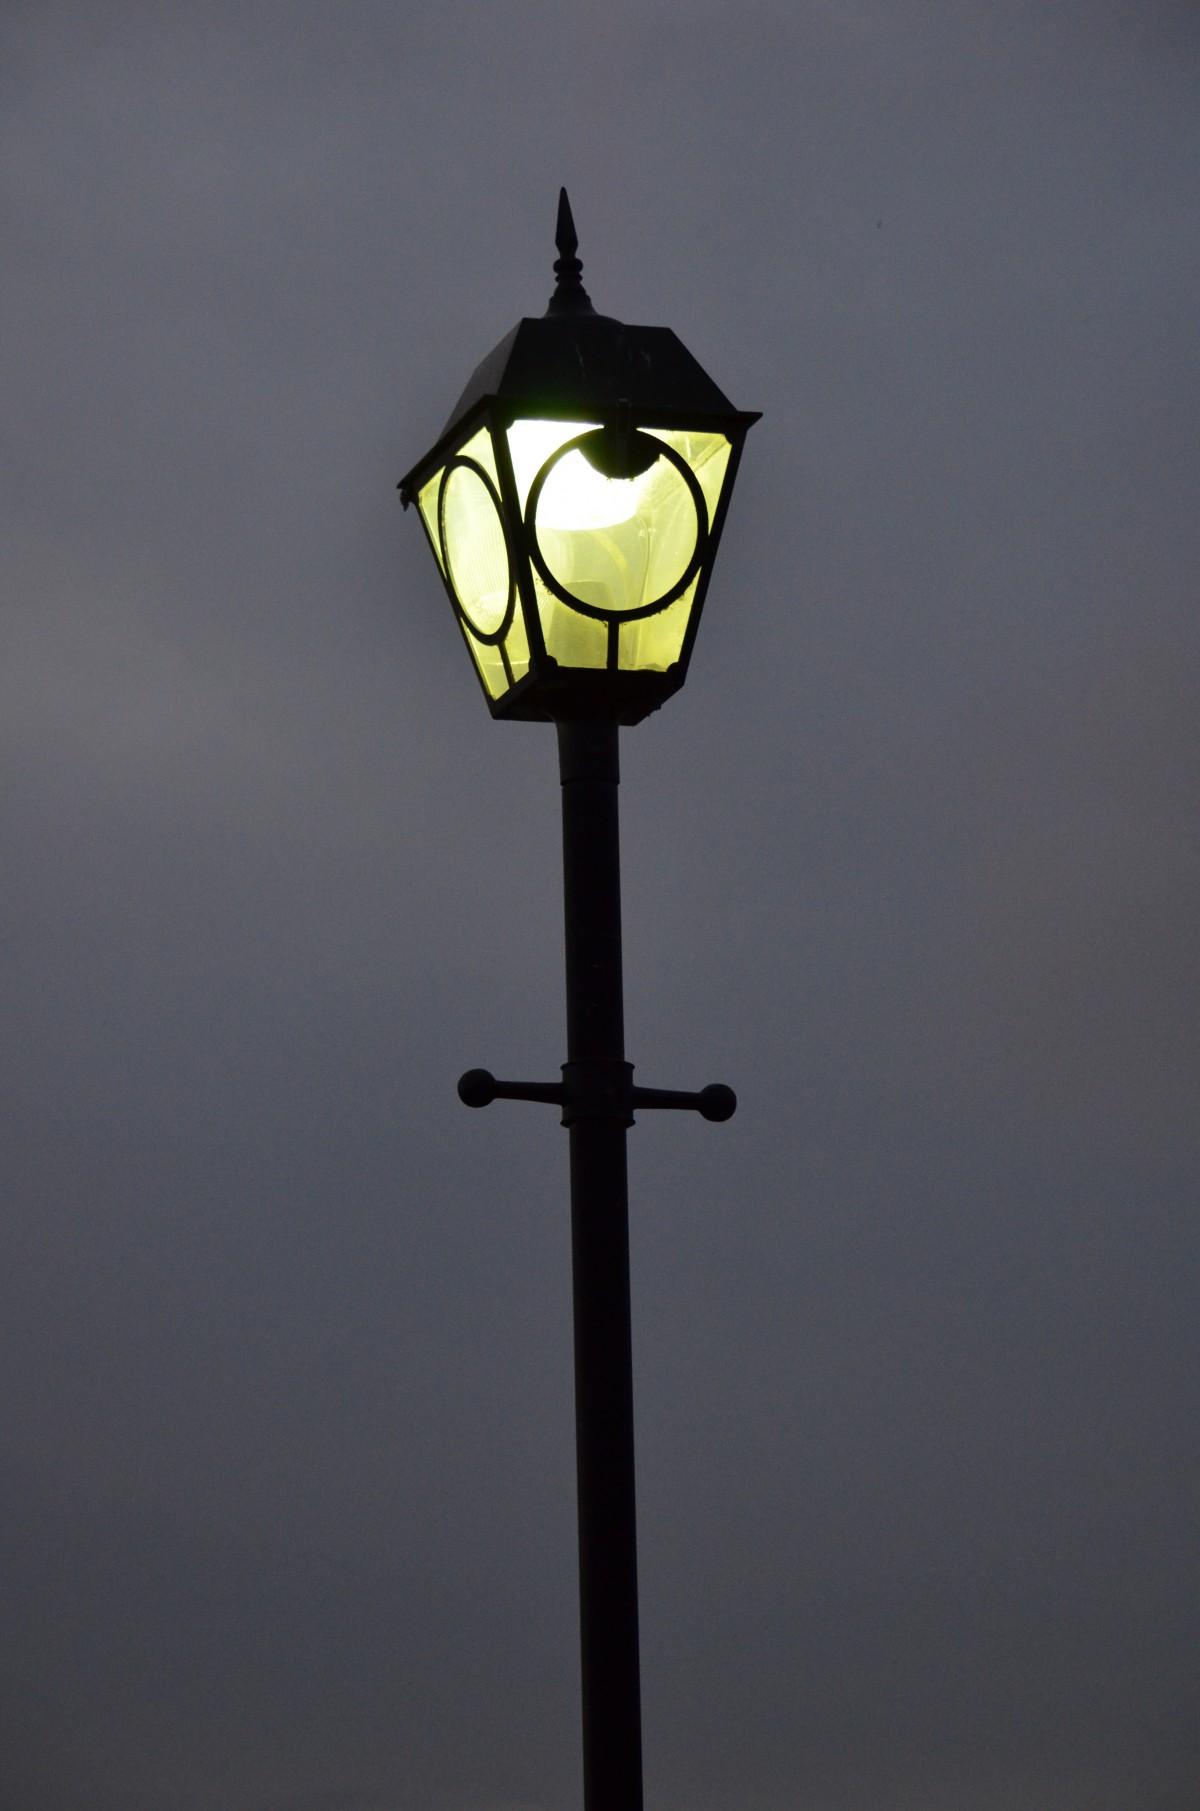 Free Images Sky Technology Road Night Dark Pole